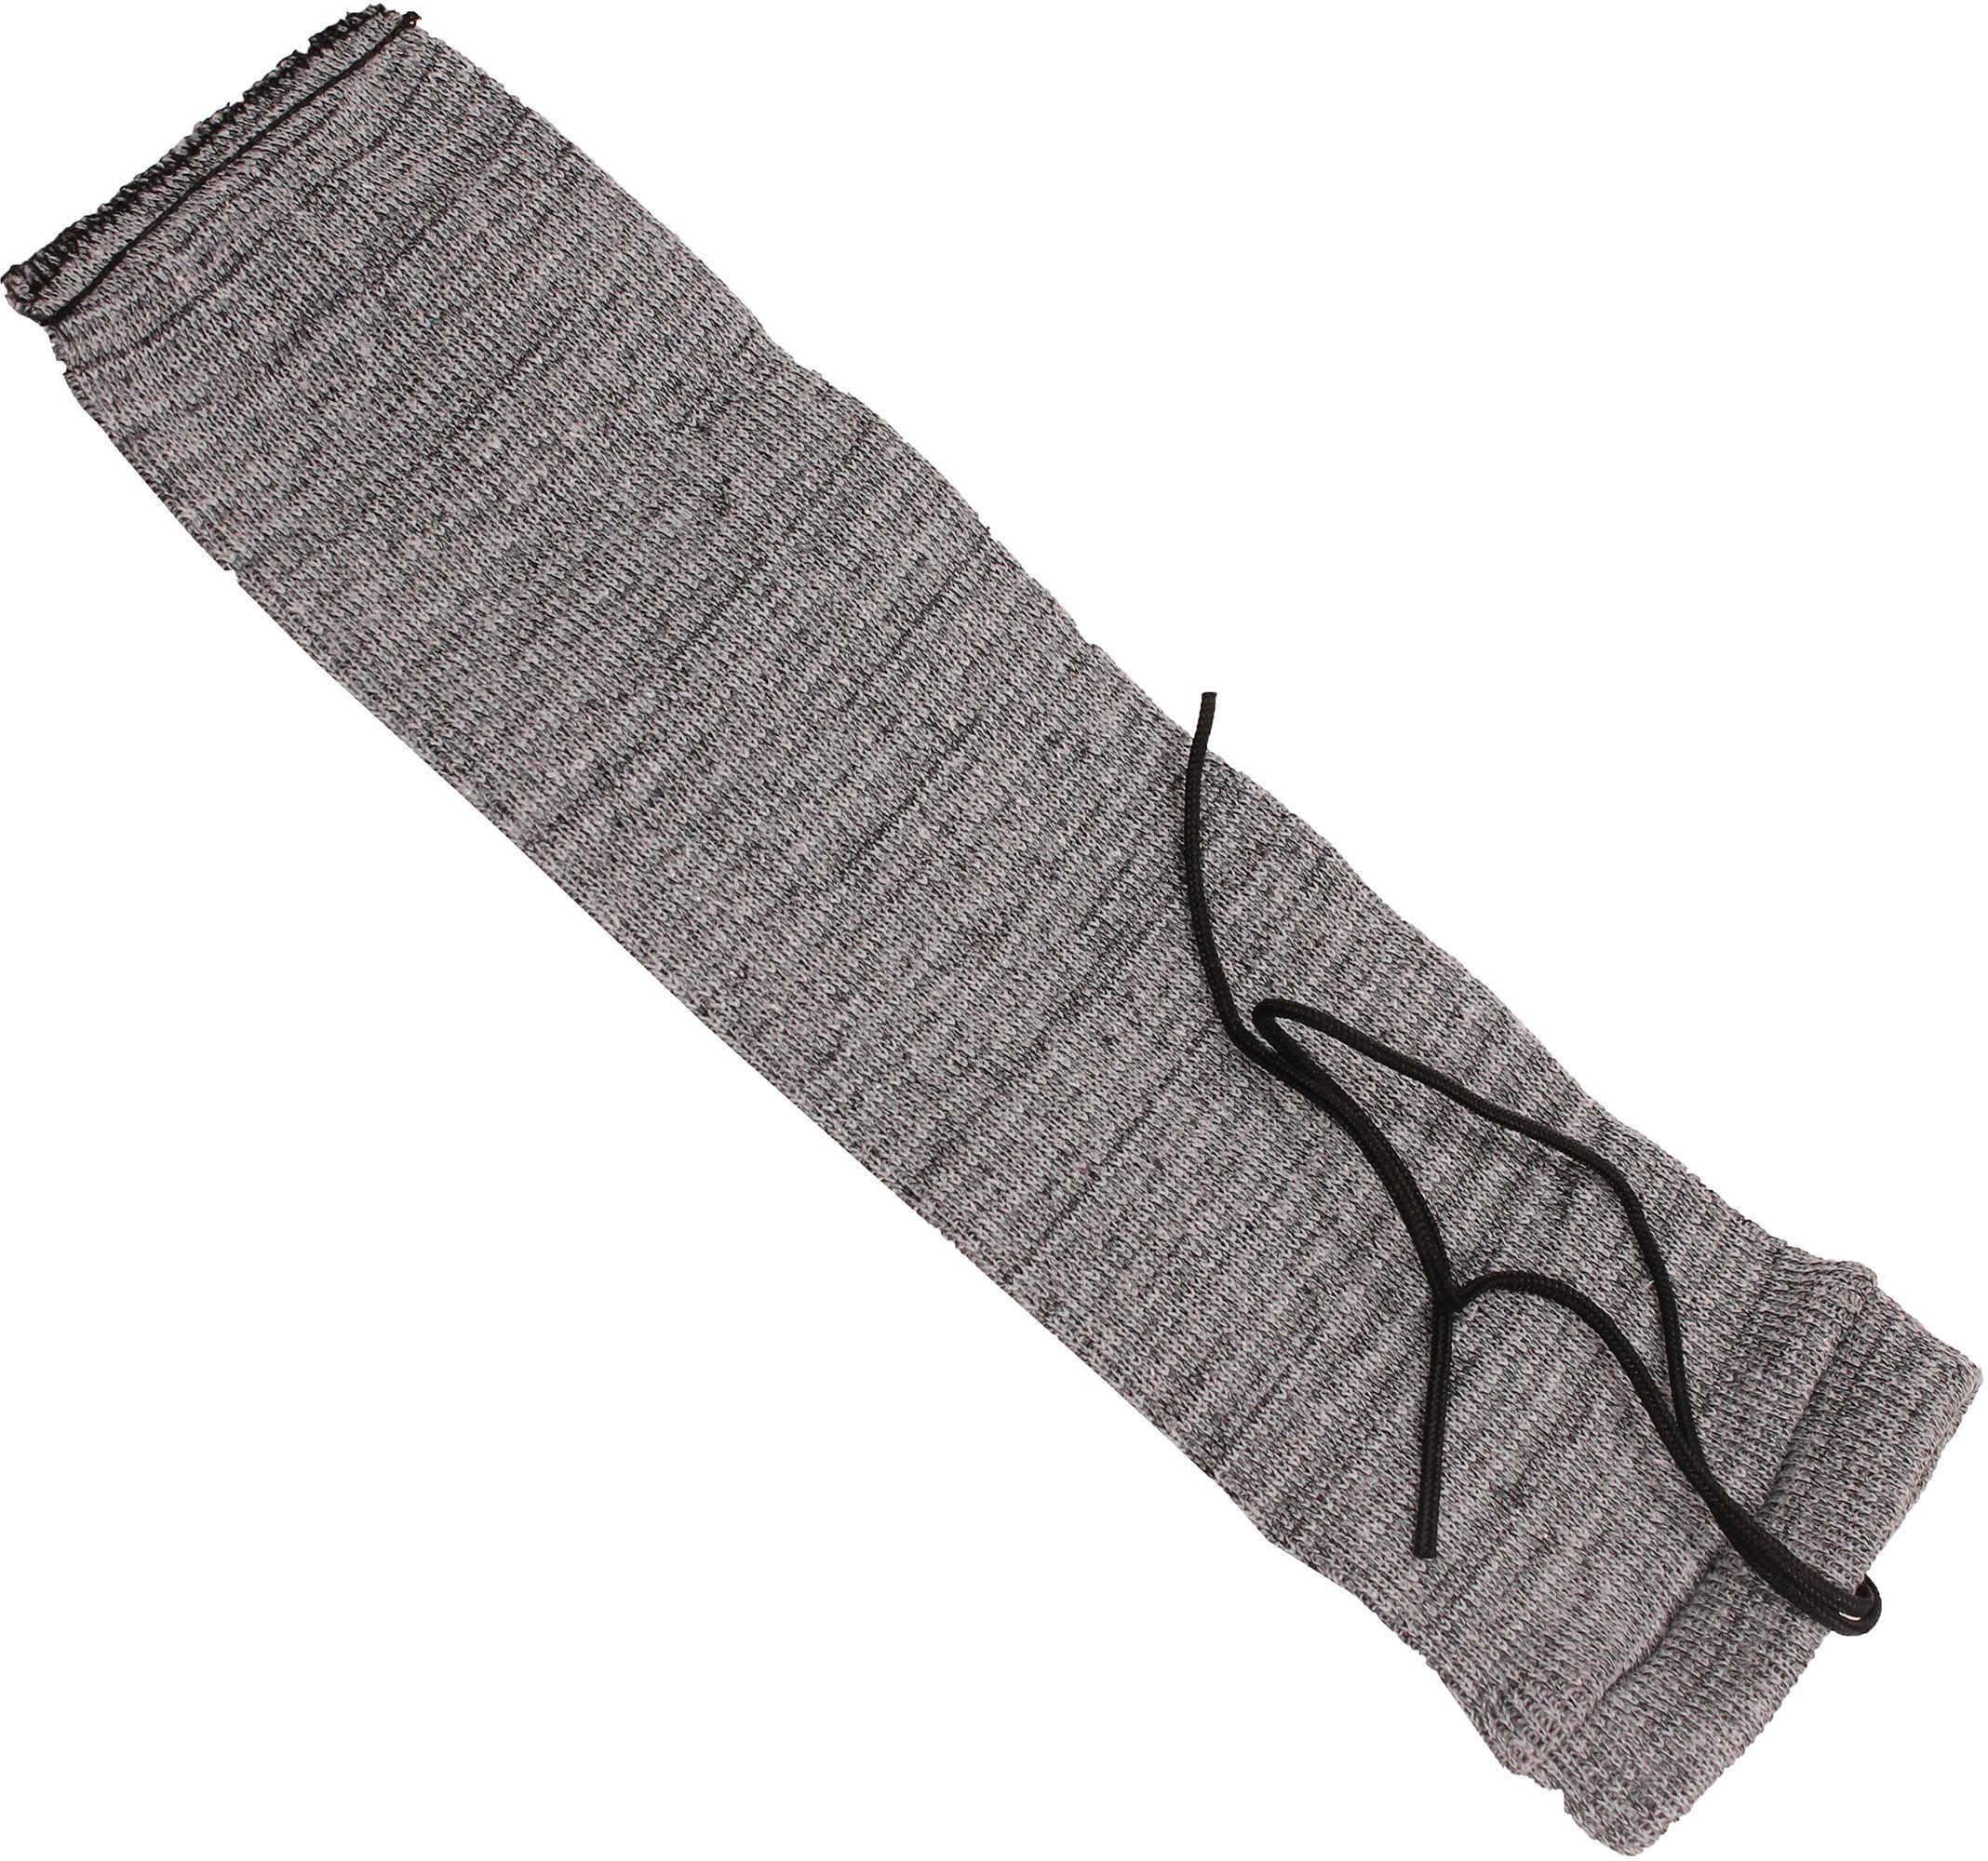 "Allen Cases Knit Gun Sock 14"" Gray 1314"